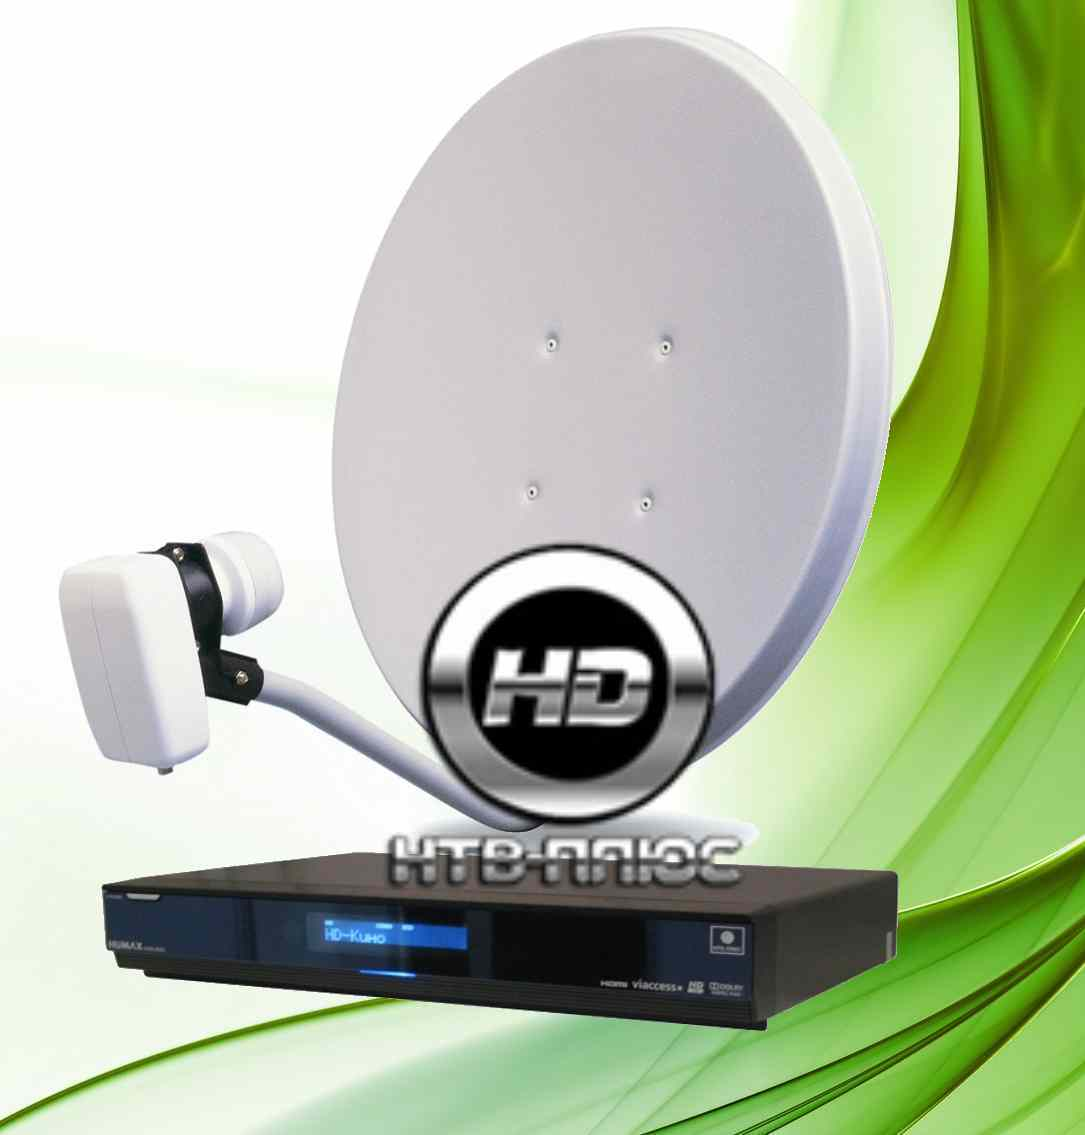 Спутниковые каналы телеканалы нтв онлайн бесплатно 14 фотография